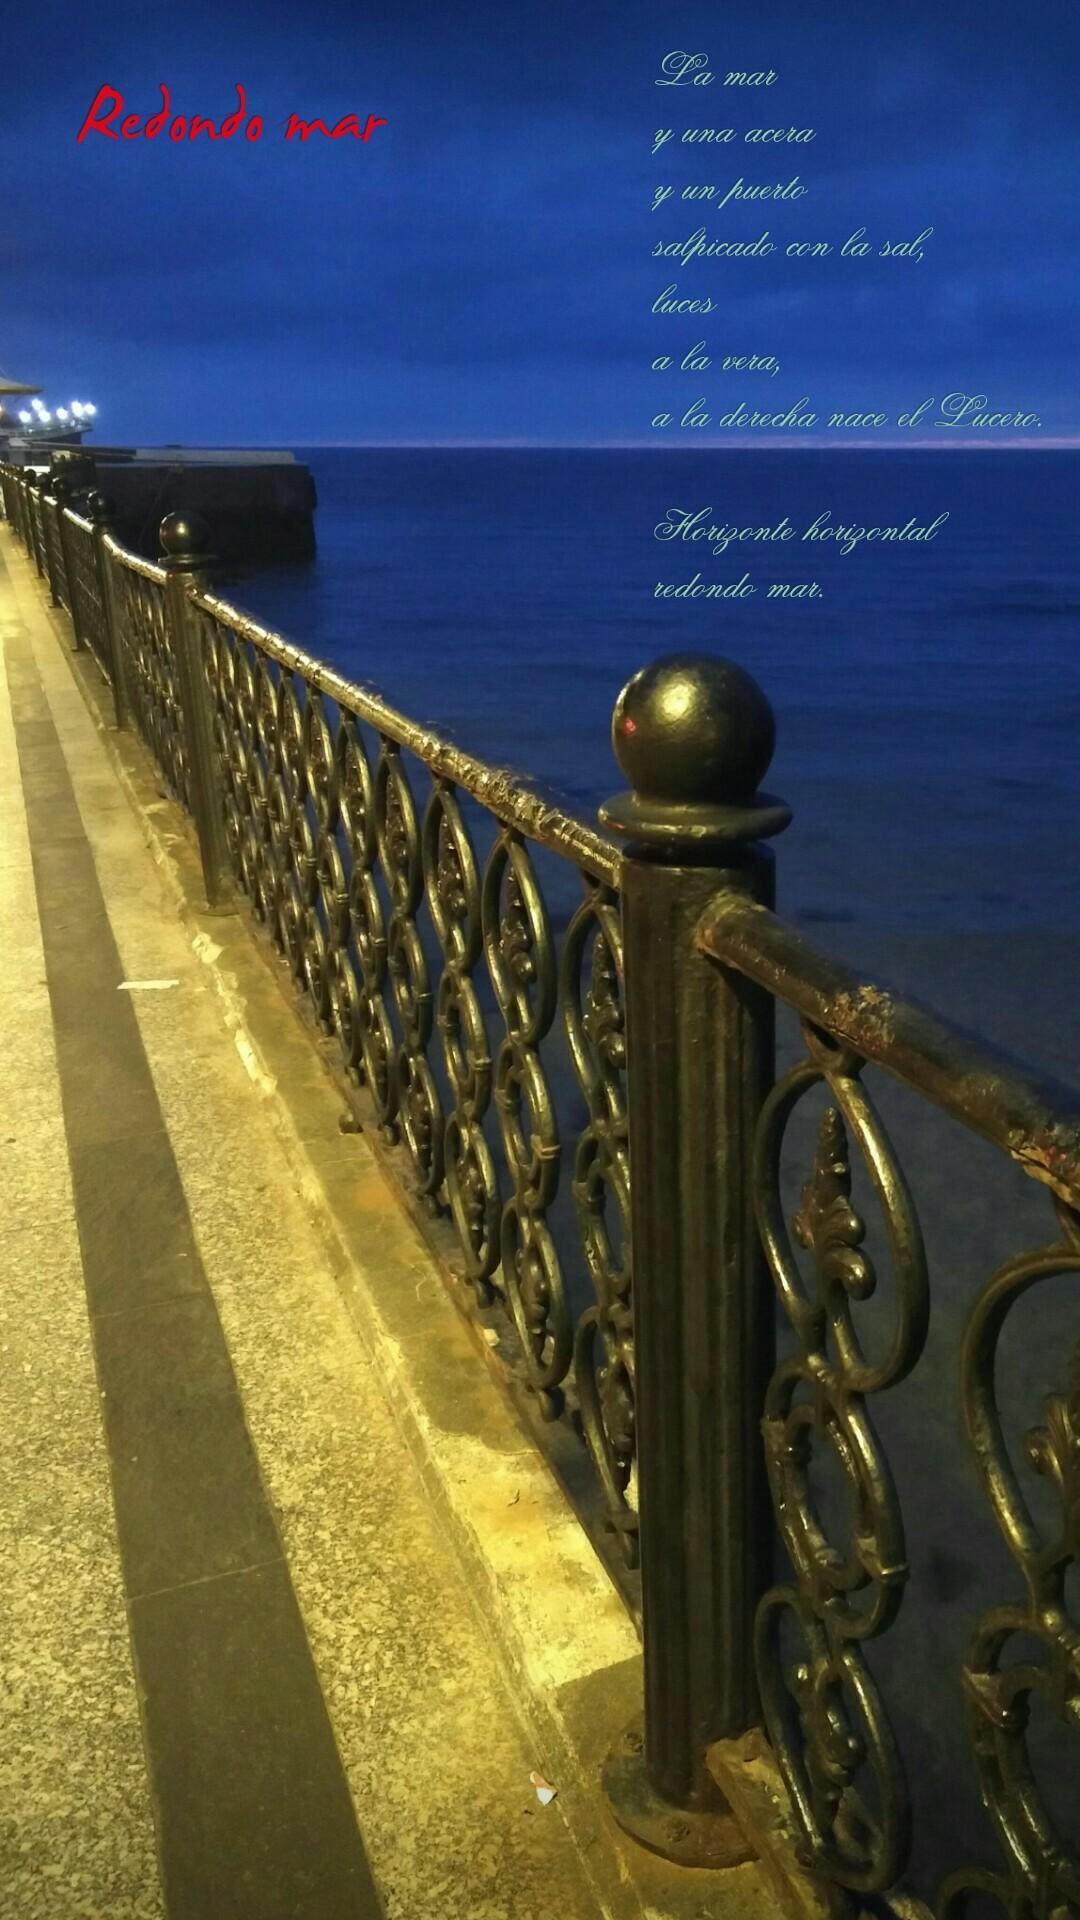 Redondo mar